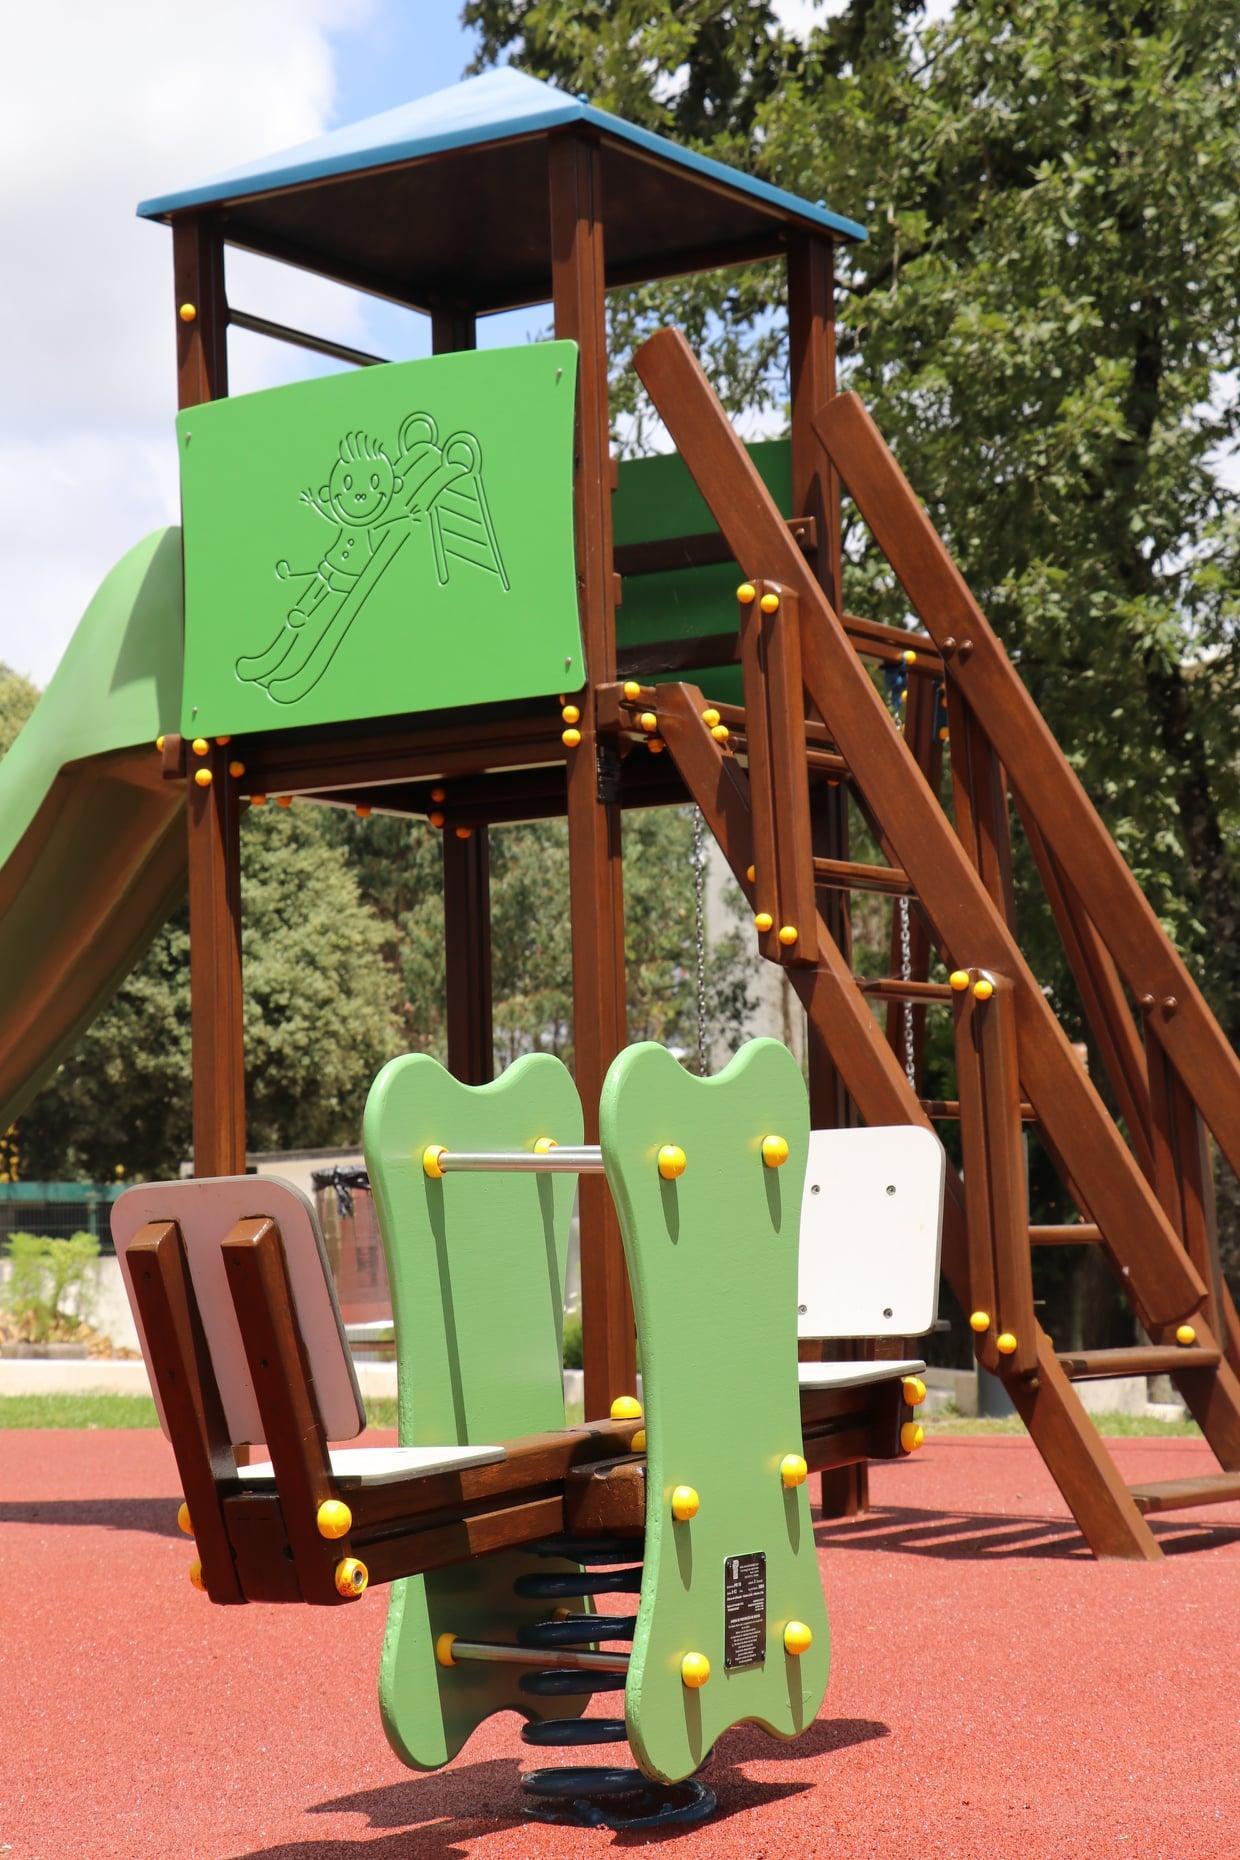 Parque Infantil renovado